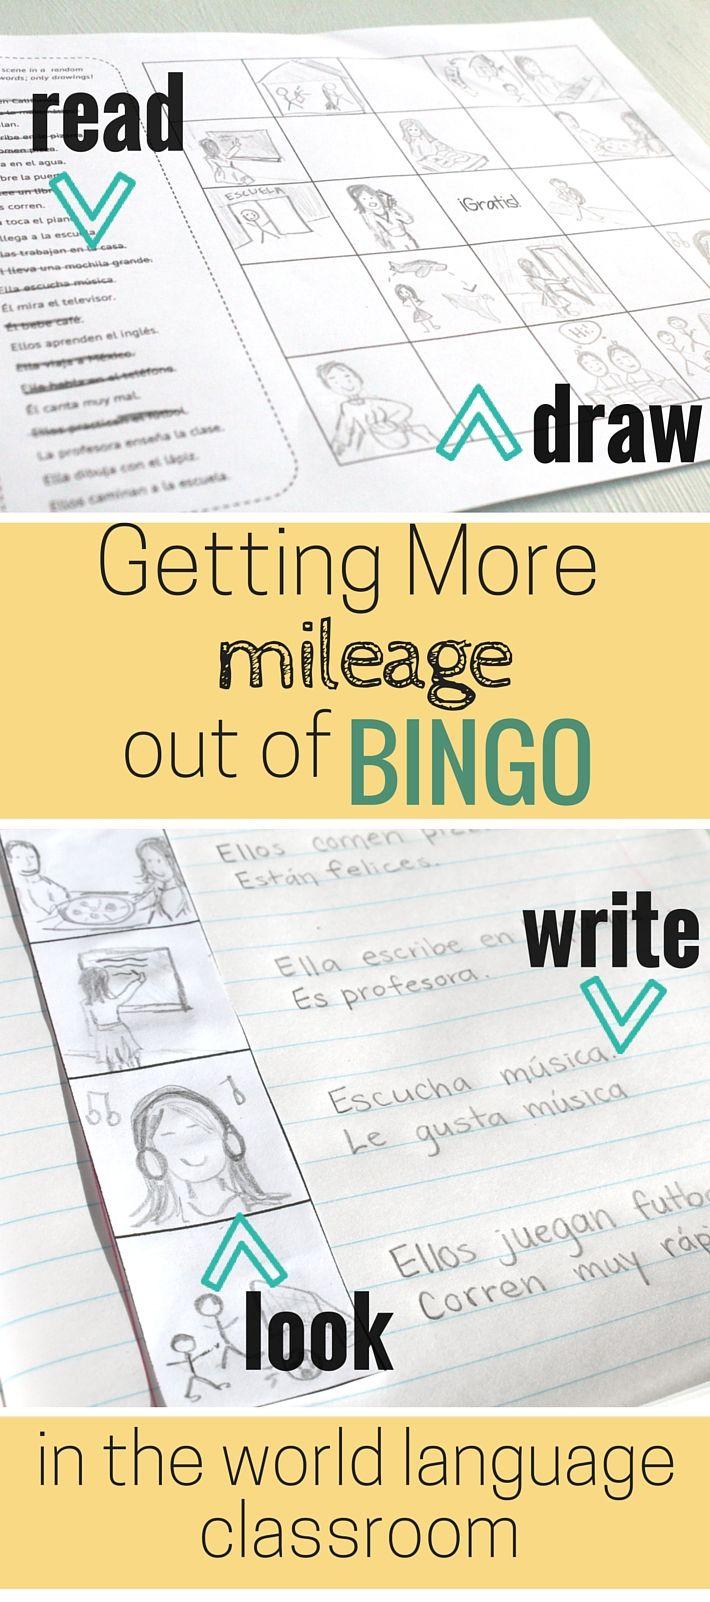 Bingo in the World Language Classroom | World language ...